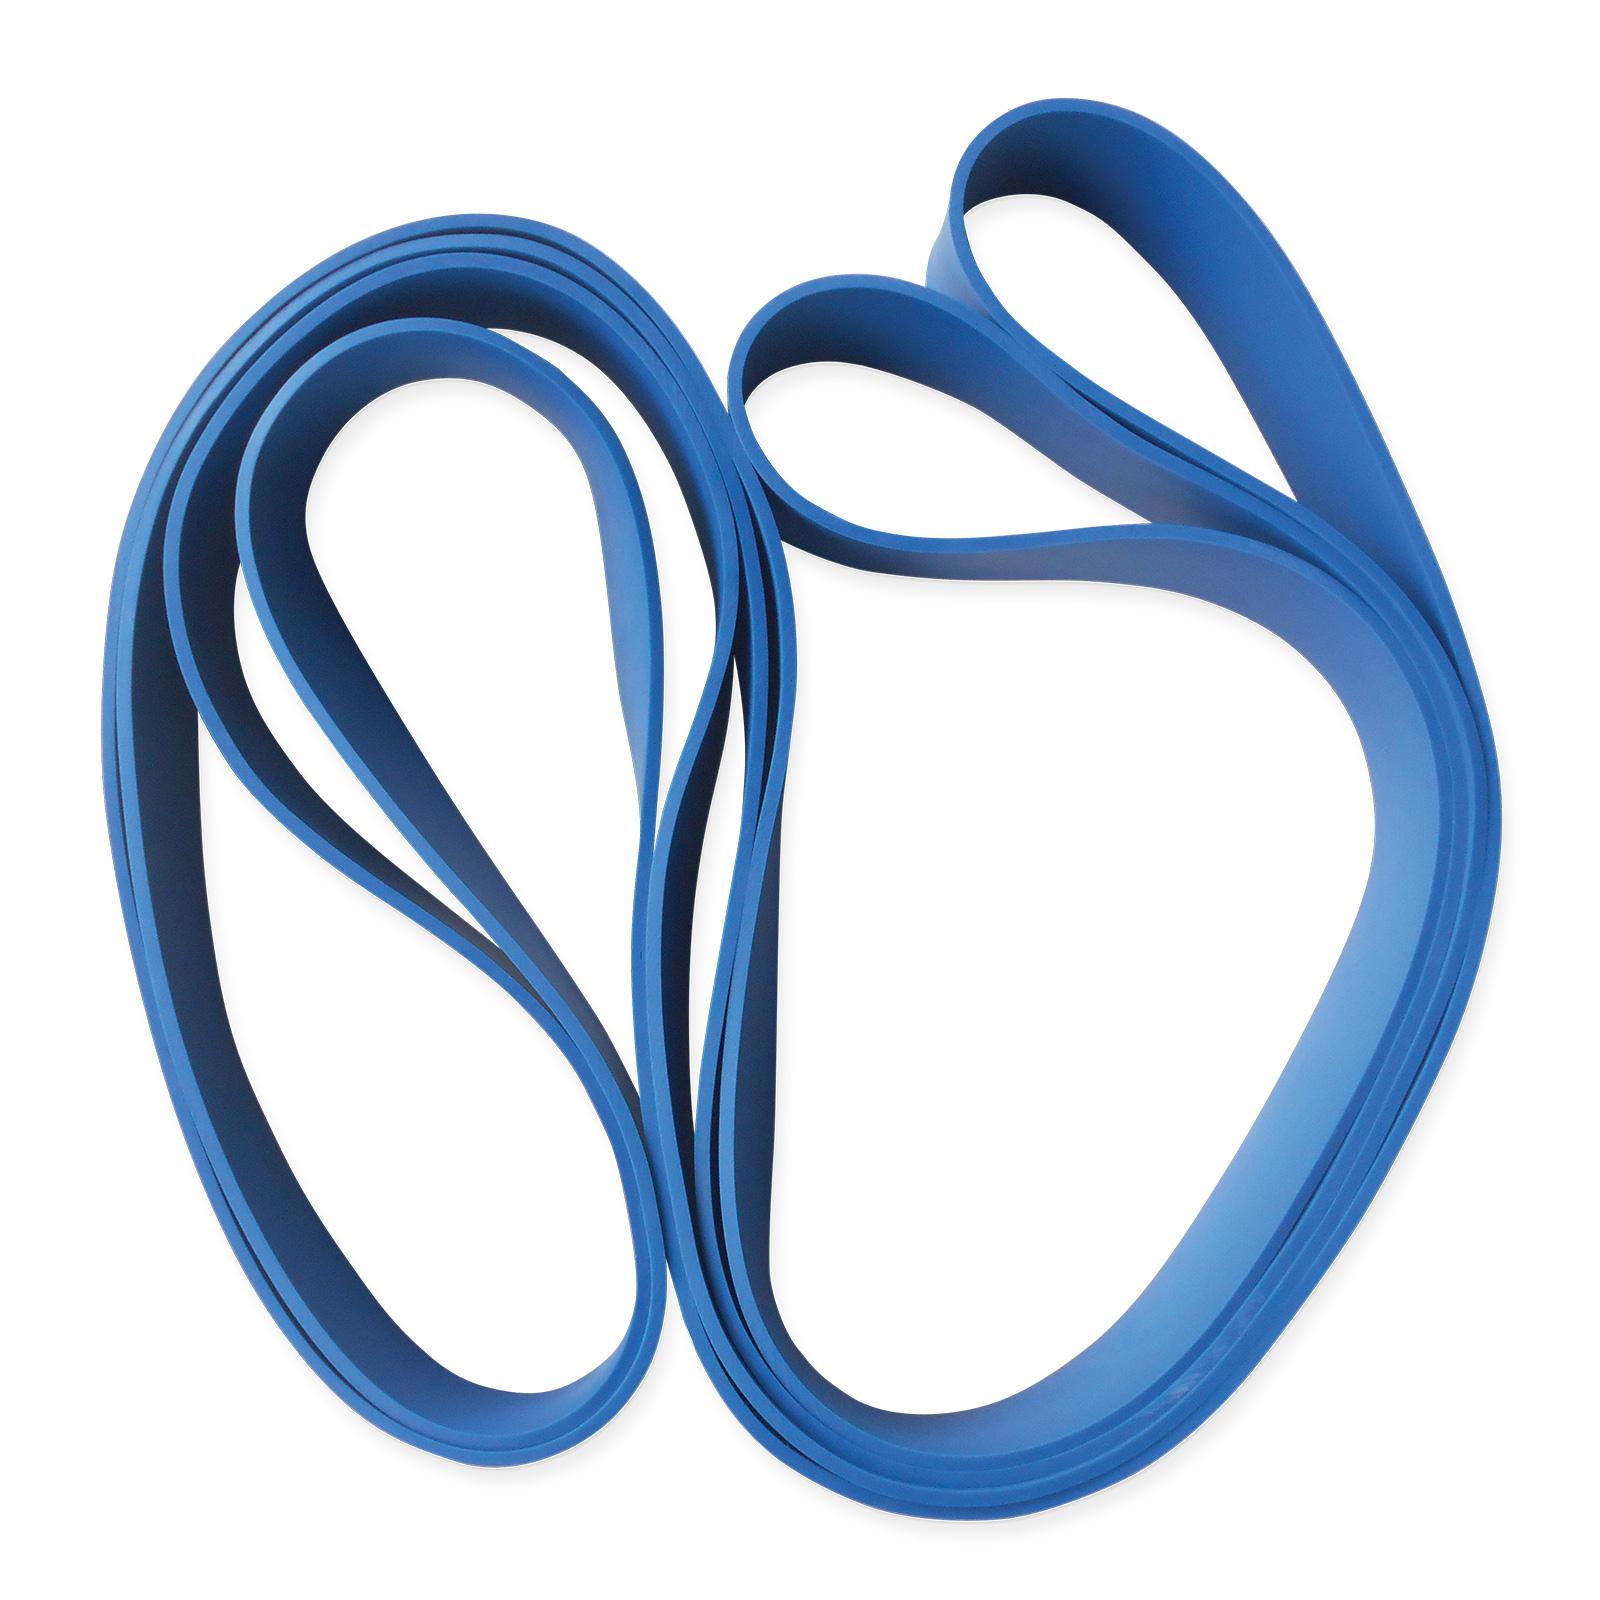 Maxi bande elastique 2m Bleue - Forte